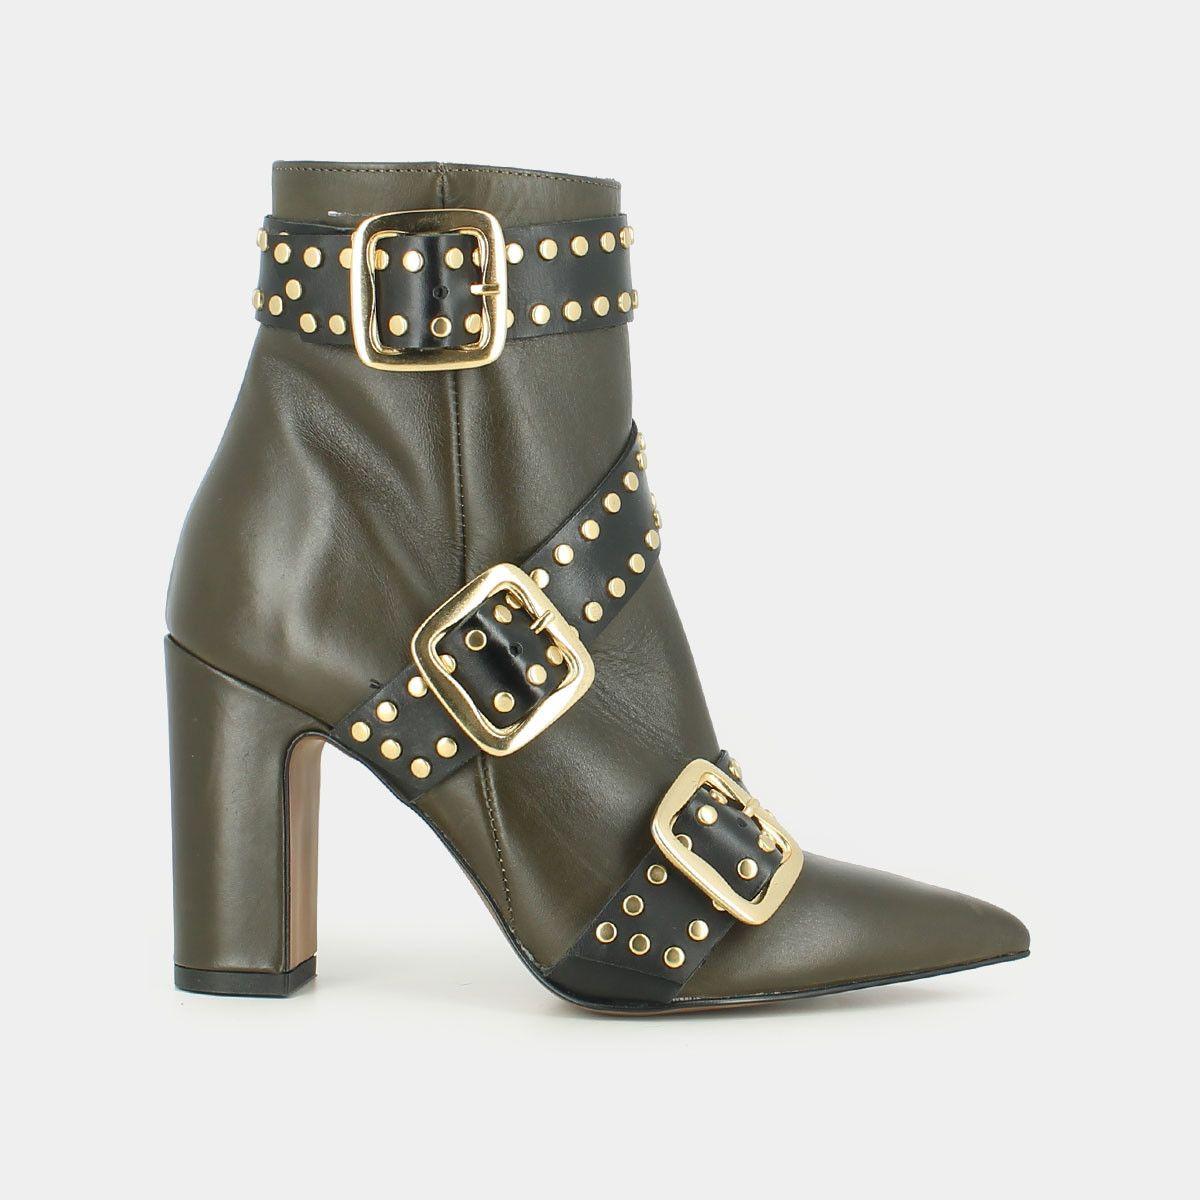 bfb2a0253fa7 Boots à boucles en cuir kaki - Jonak kaki noir